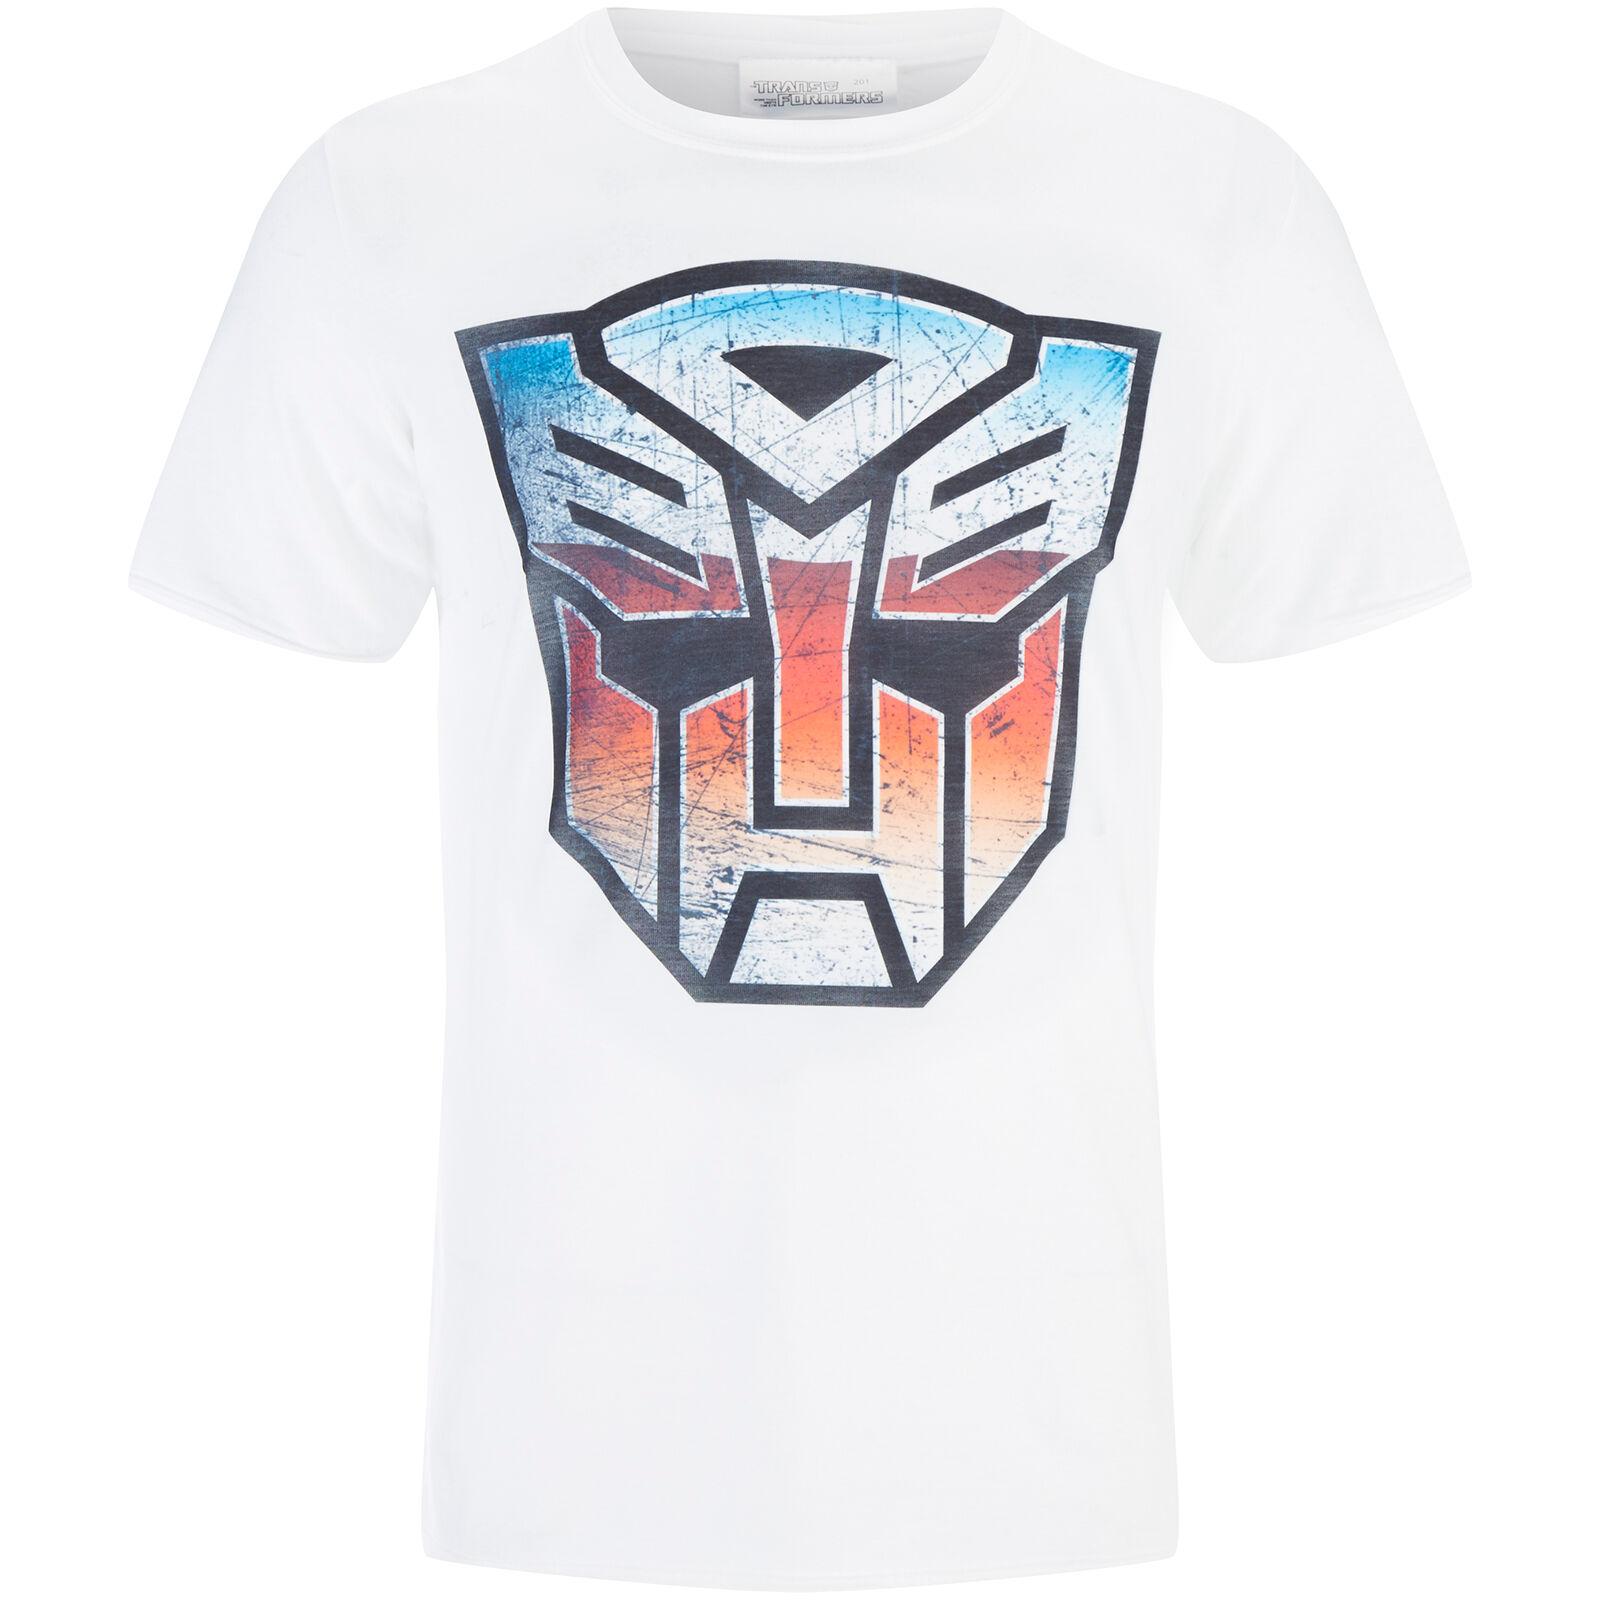 Geek Clothing Transformers Men's Transformers Multi Emblem T-Shirt - White - XXL - White